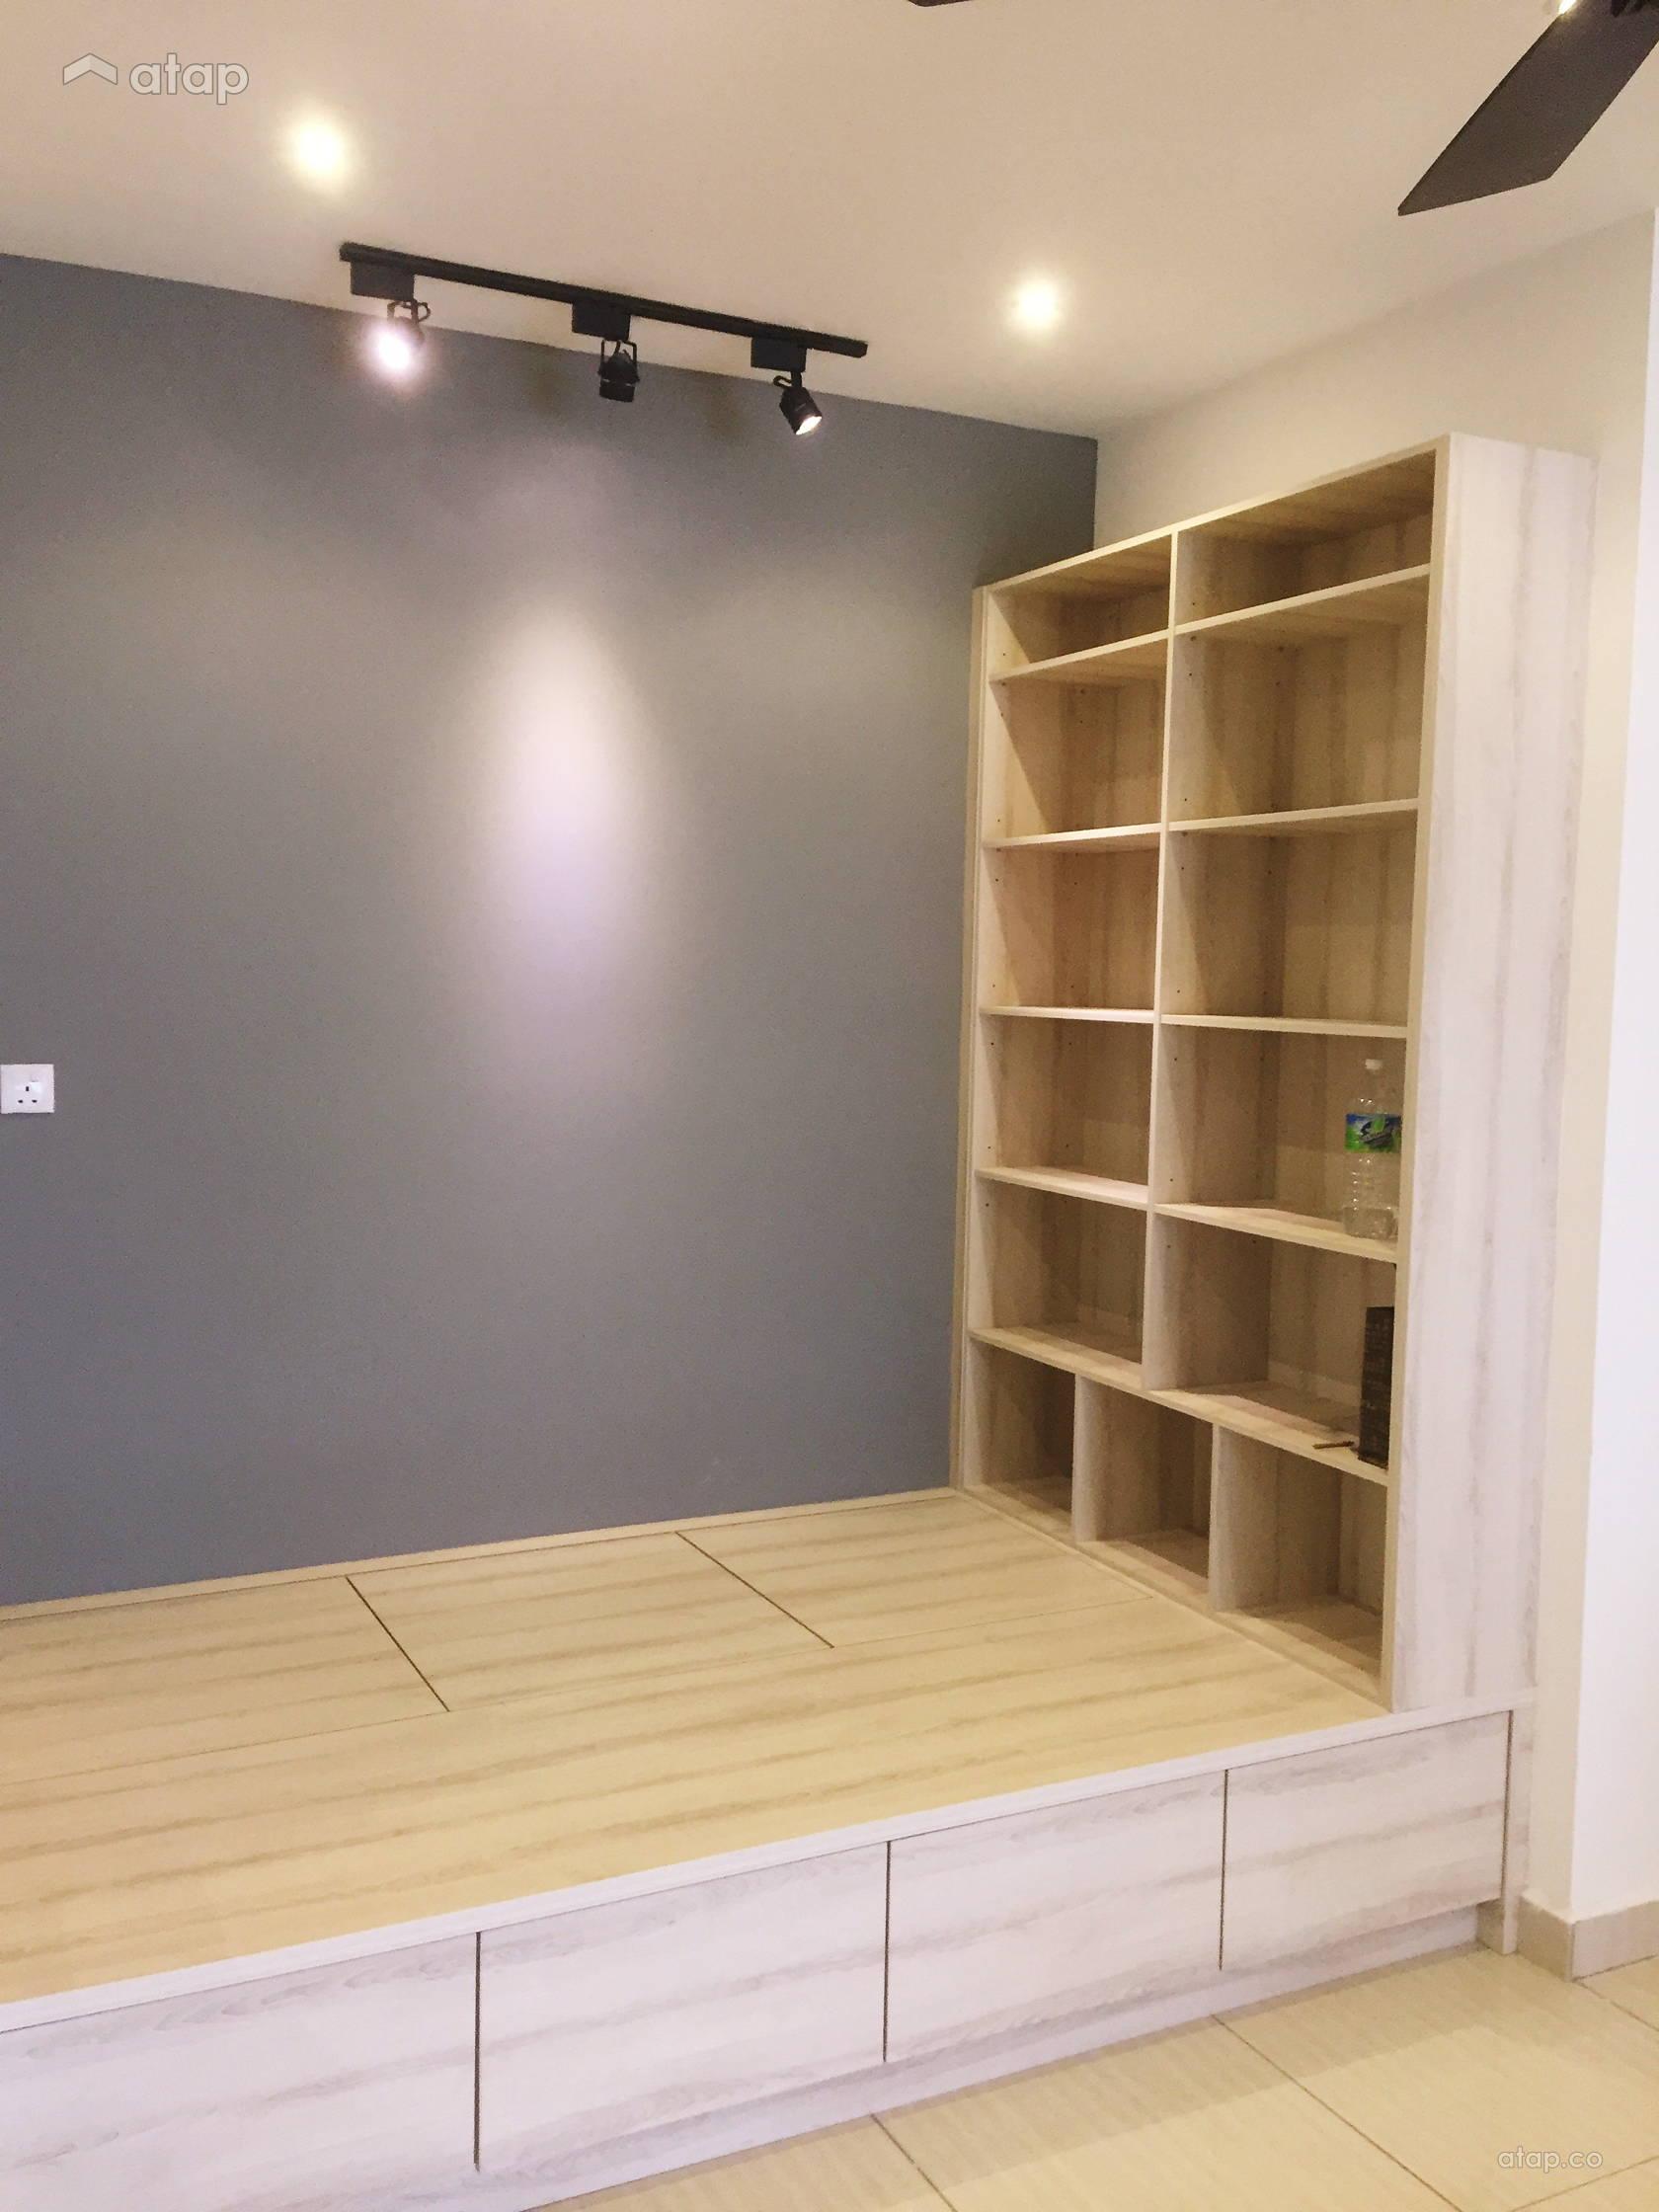 Condominium Study Room: Minimalistic Modern Living Room Study Room Condominium